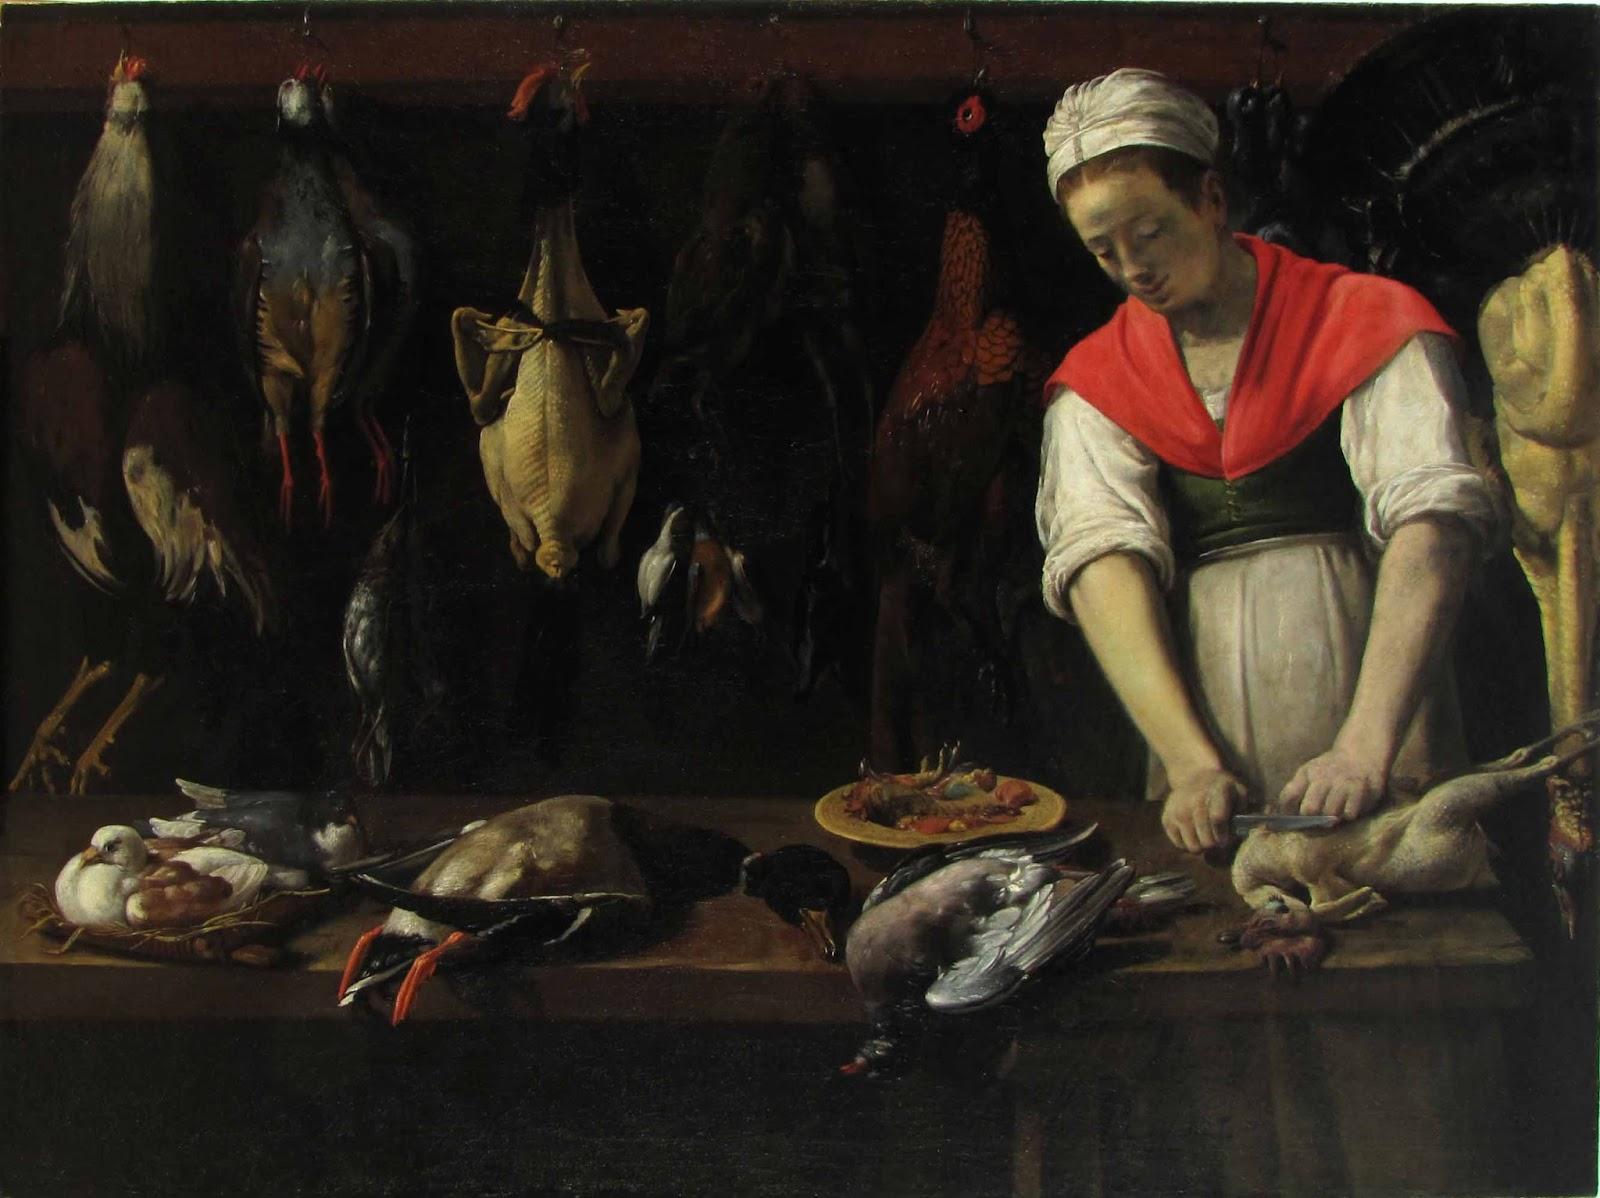 Senza Confini: NELLE ANTICHE CUCINE Cucine Storiche E Cucine Dipinte #A43427 1600 1198 Foto Di Cucine Di Casa